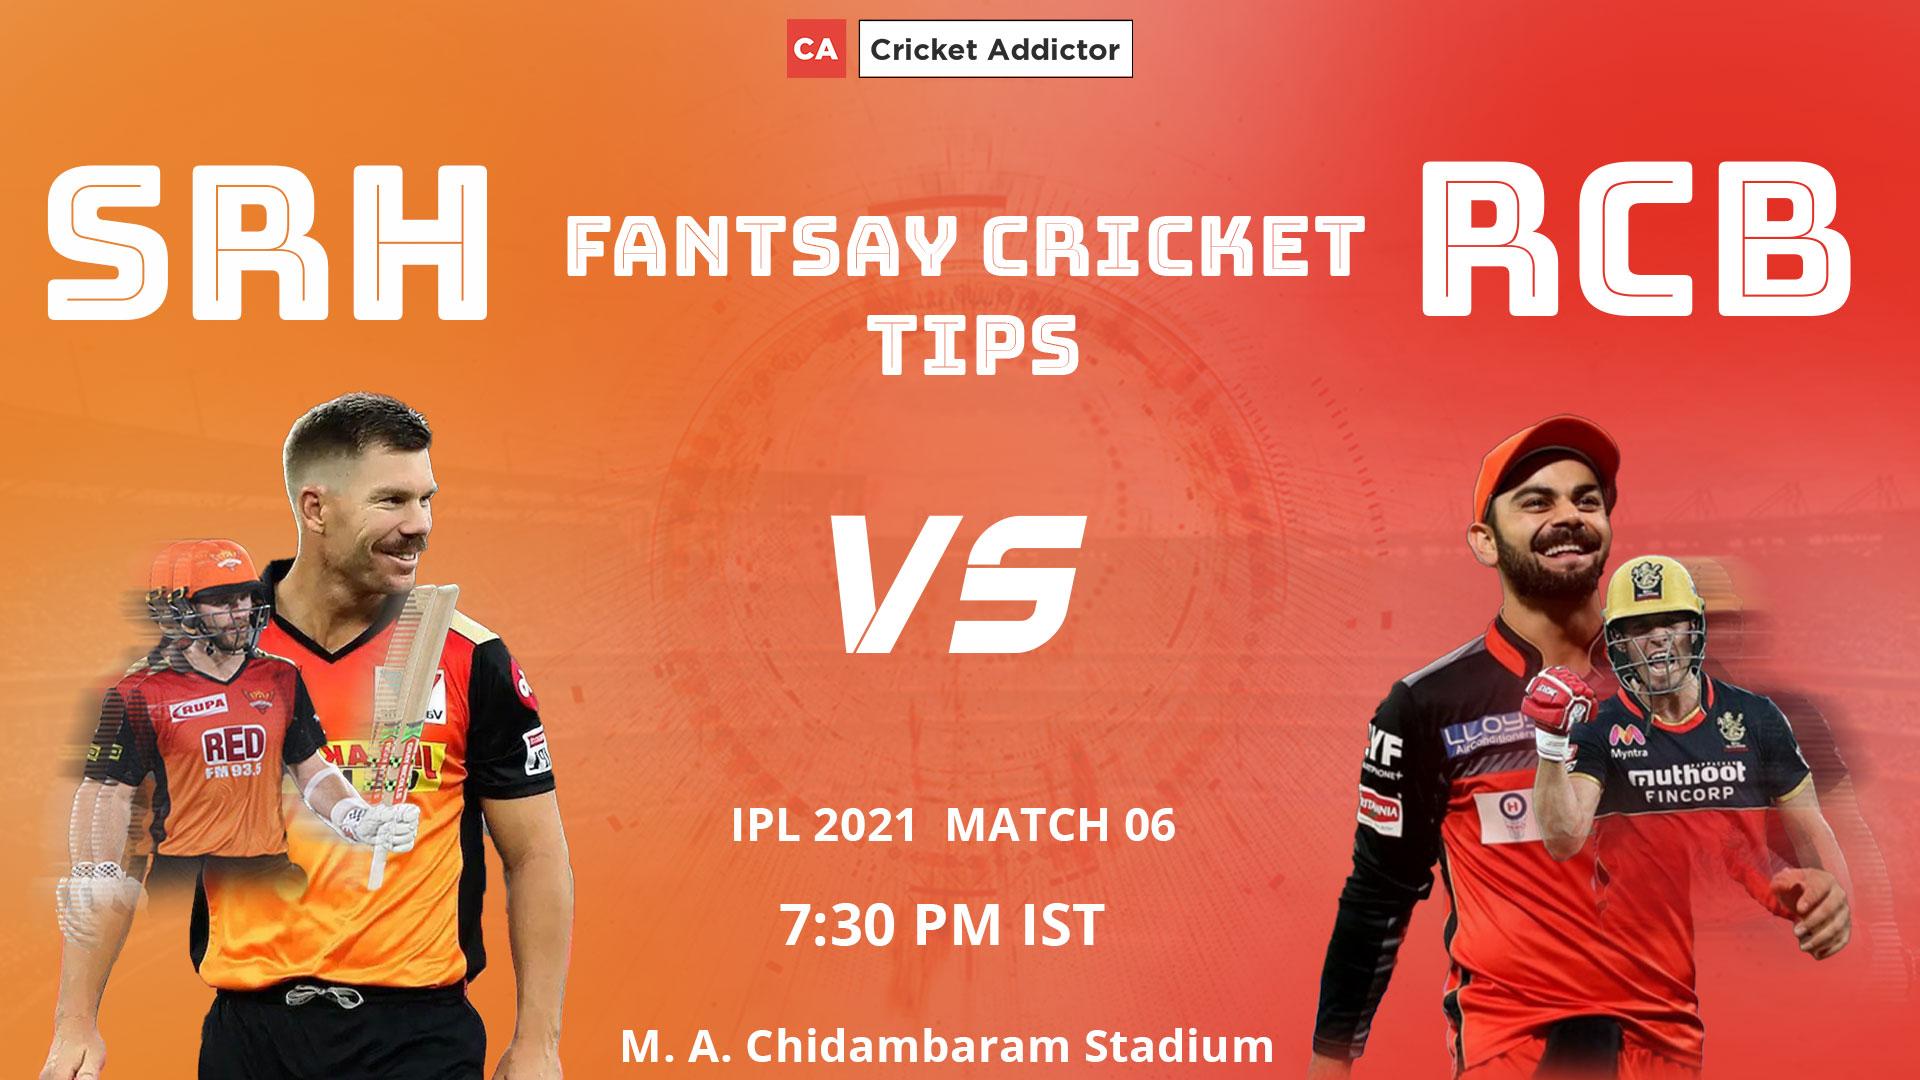 SunRisers Hyderabad (SRH) vs Royal Challengers Bangalore (RCB) Dream11 Prediction, Fantasy Cricket Tips, Playing XI, Pitch Report, Dream11 Team, Injury Update of VIVO IPL 2021.